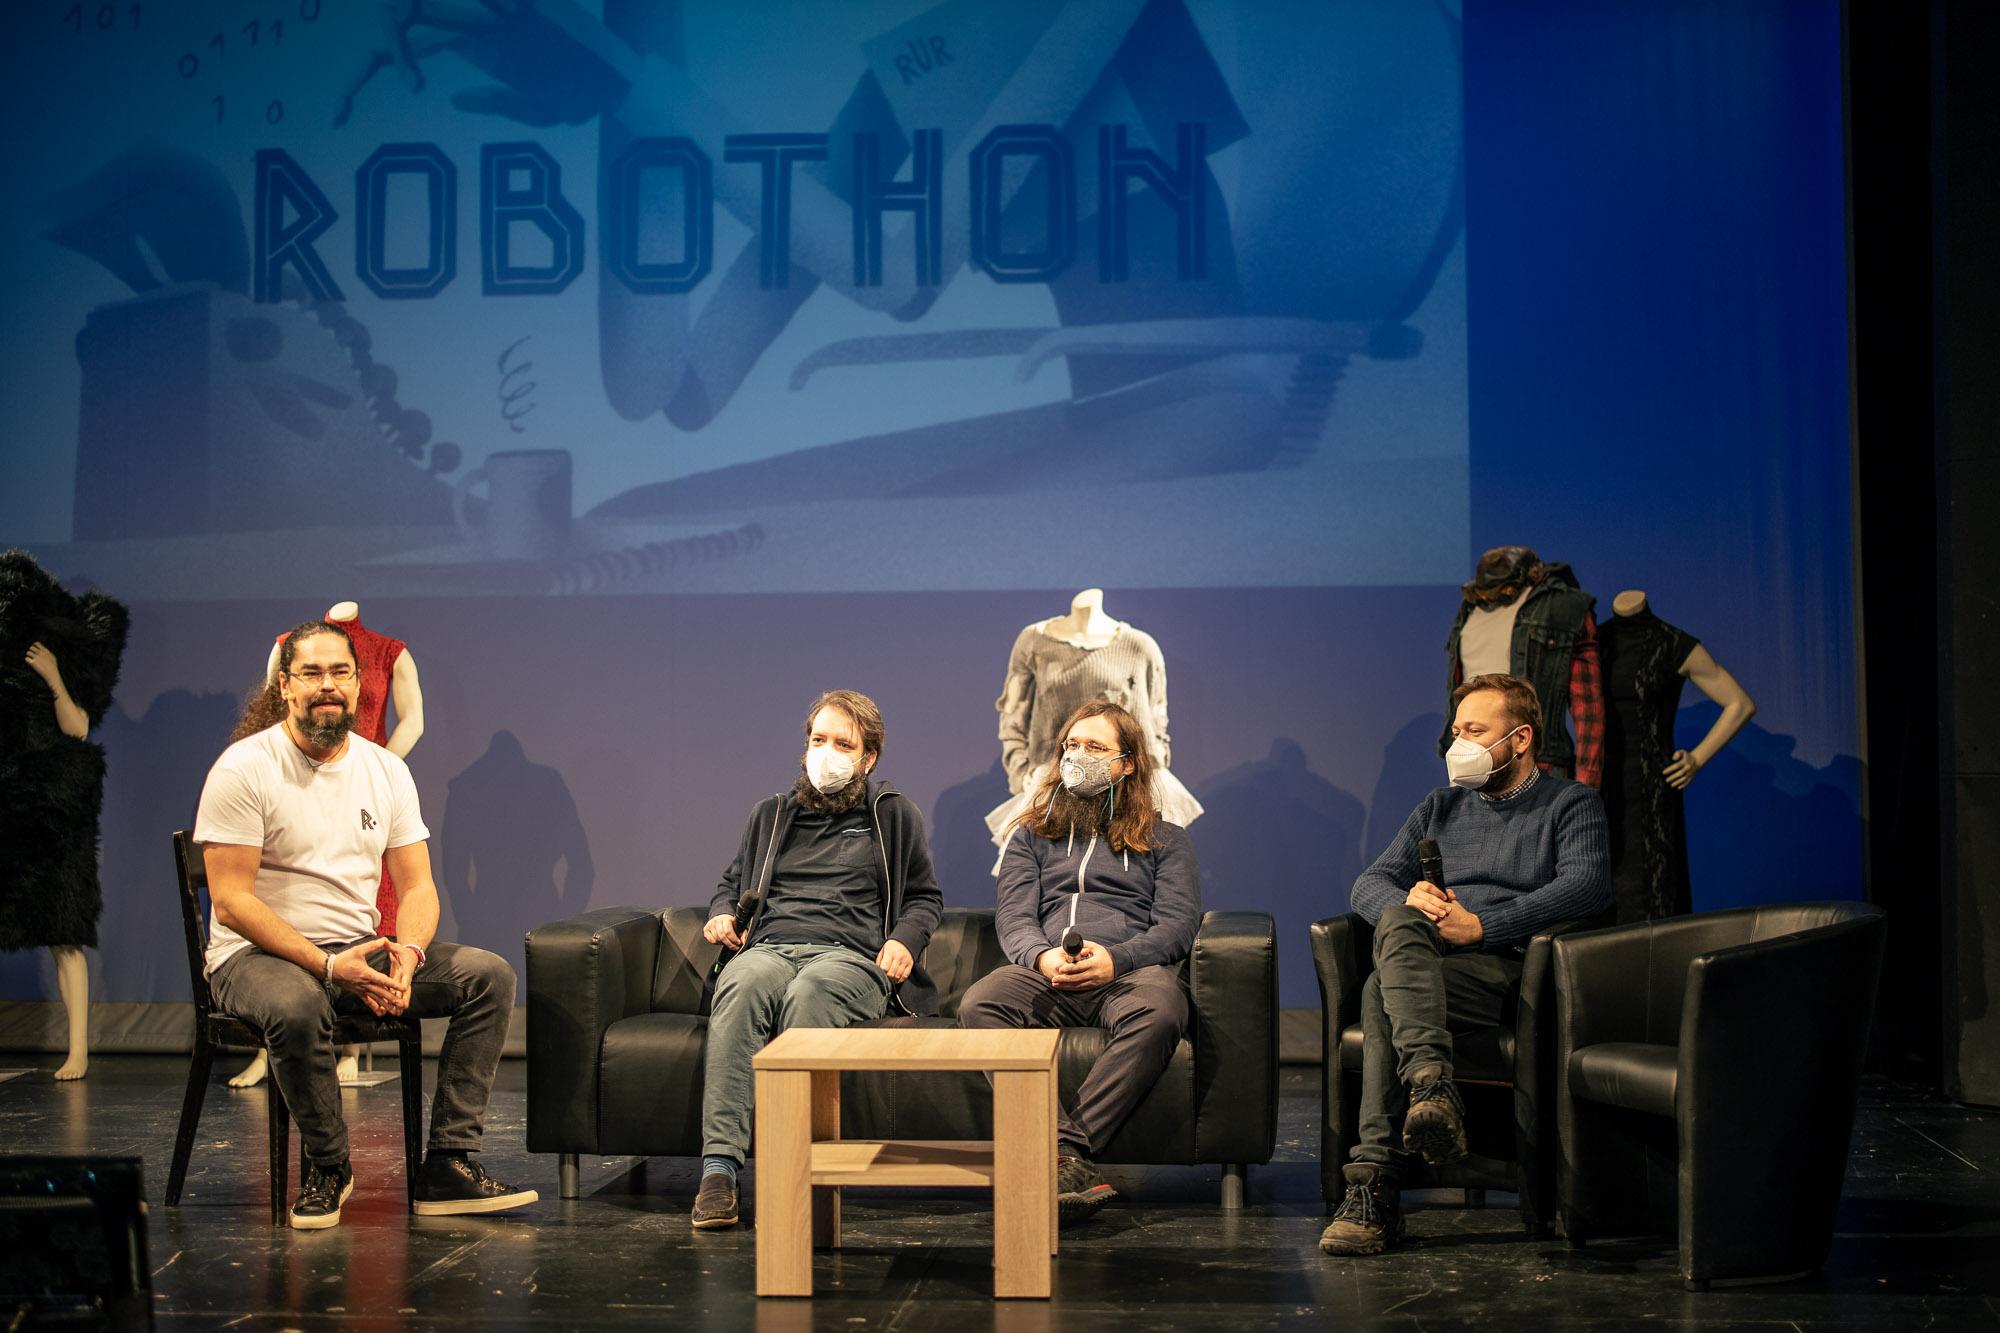 Robothon 2021